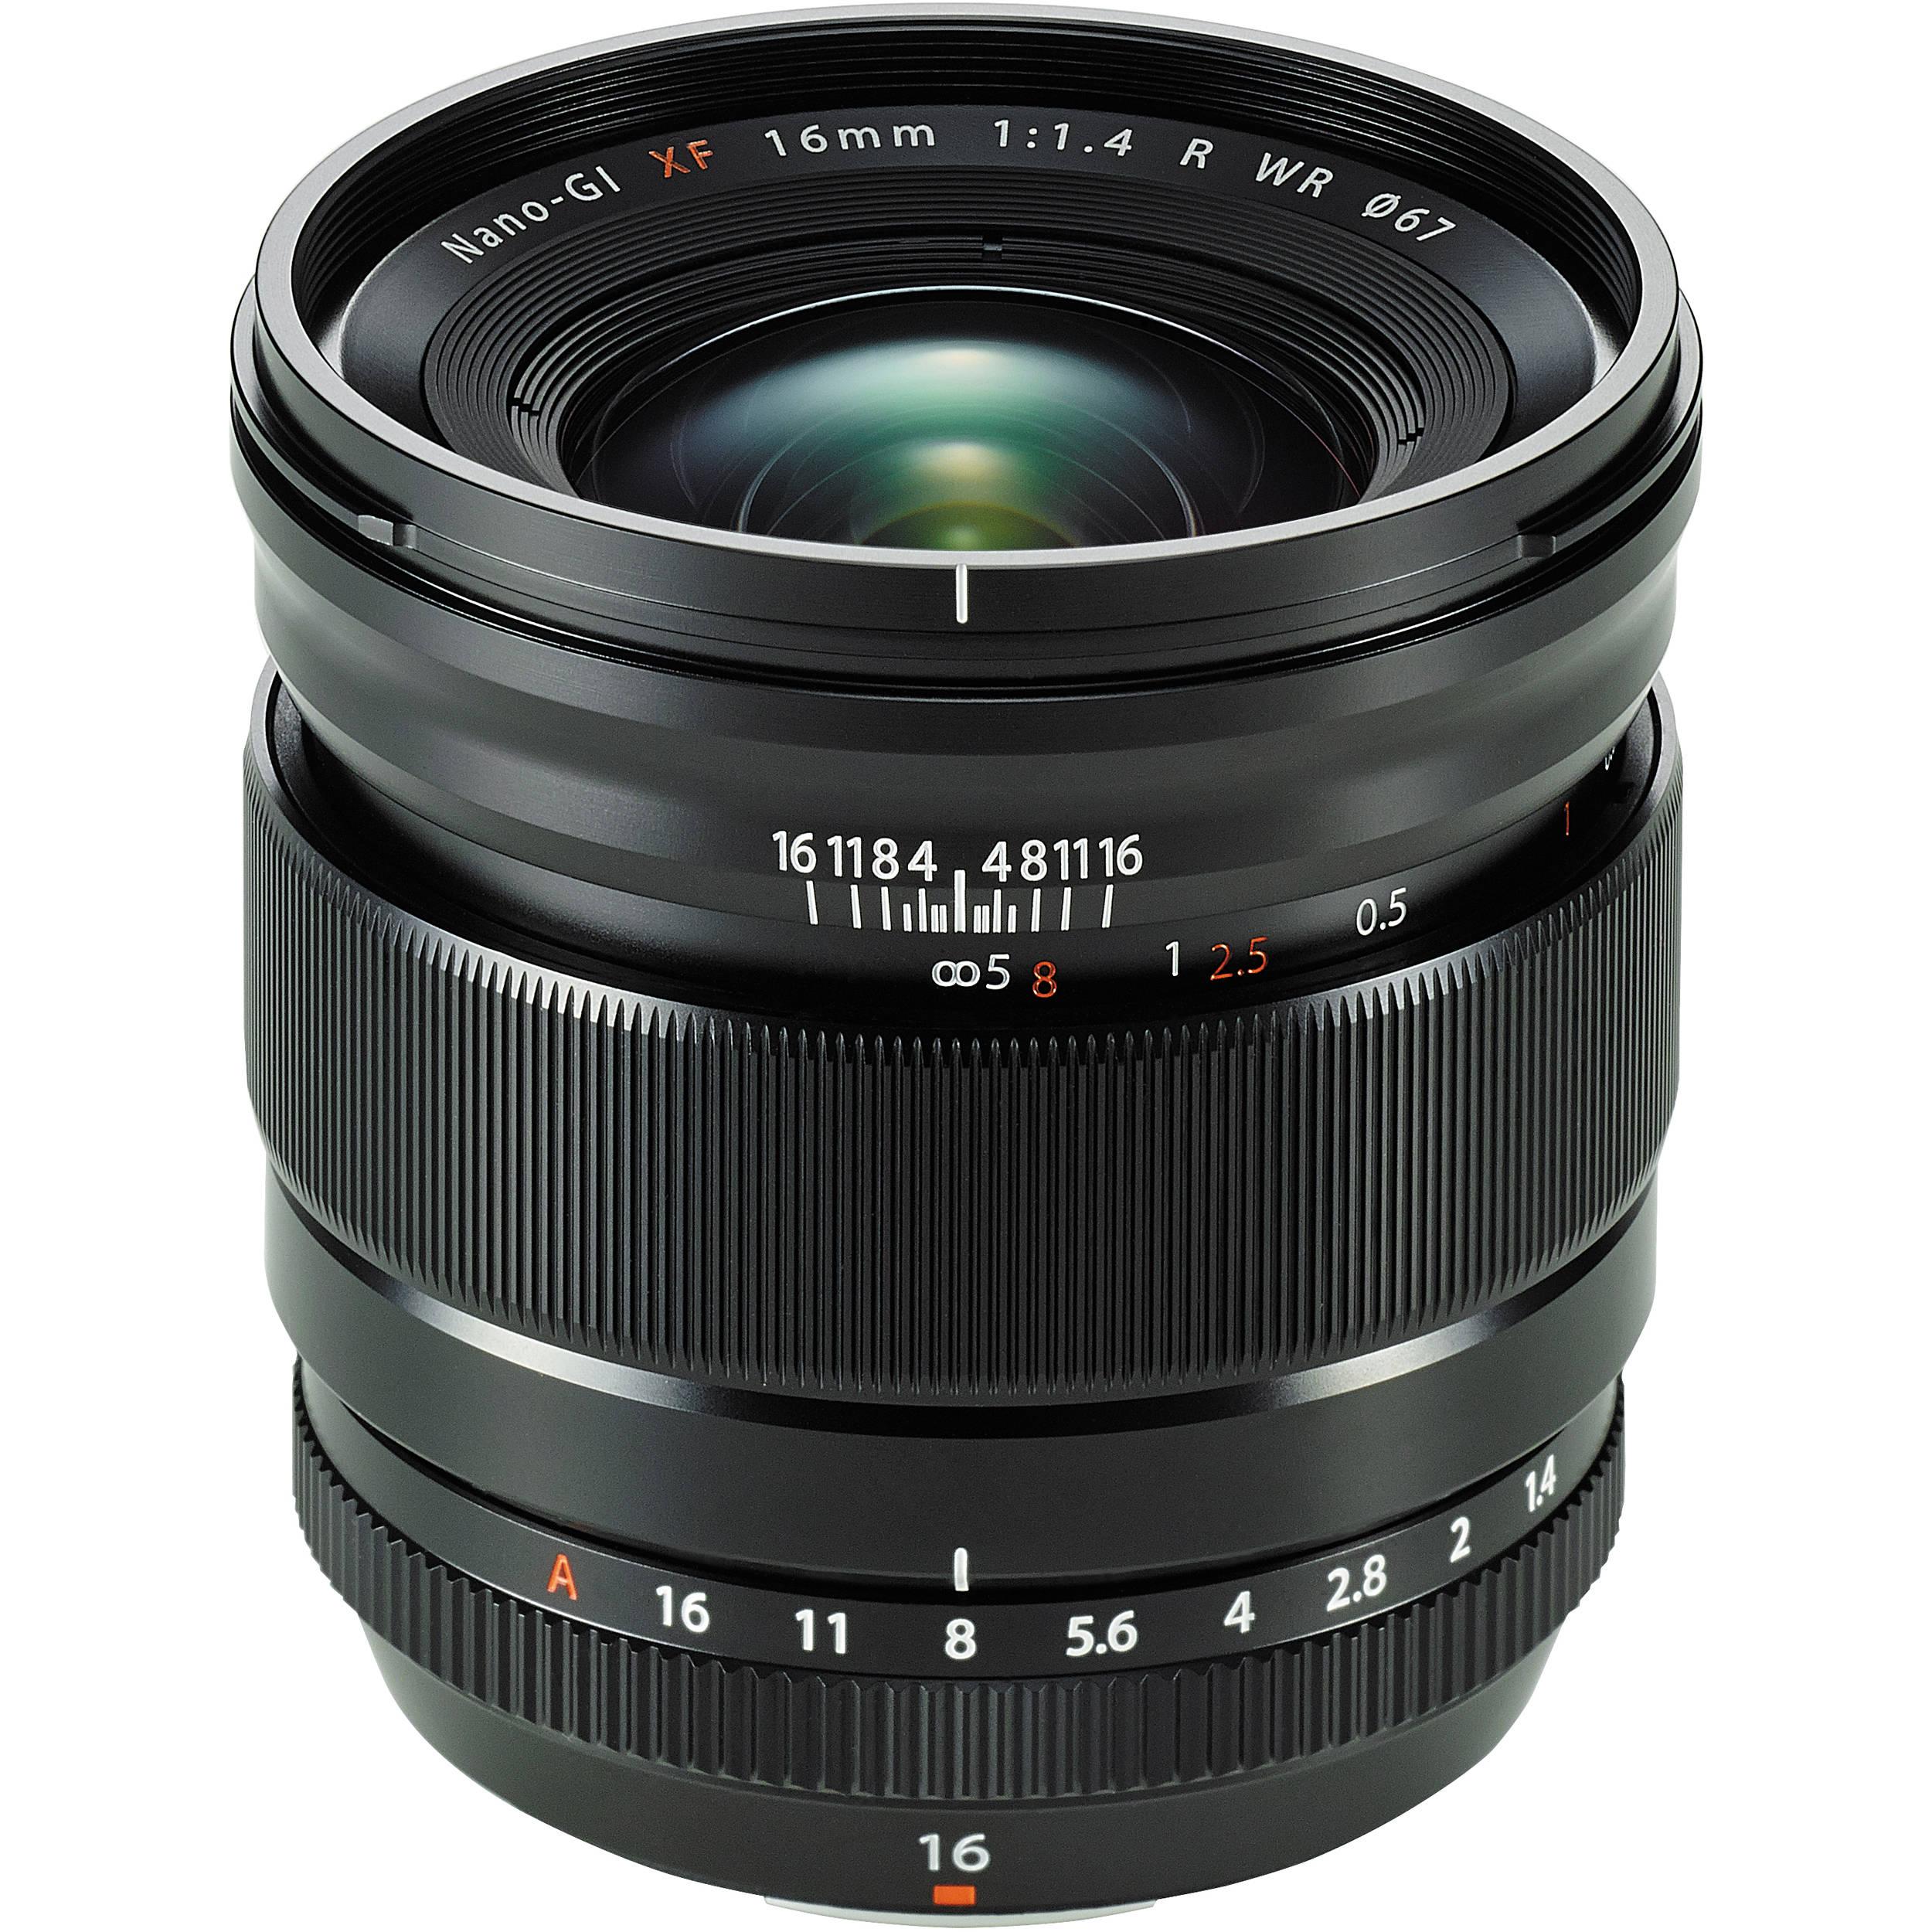 Fujifilm Fujinon XF 16mm f/1,4 R WR